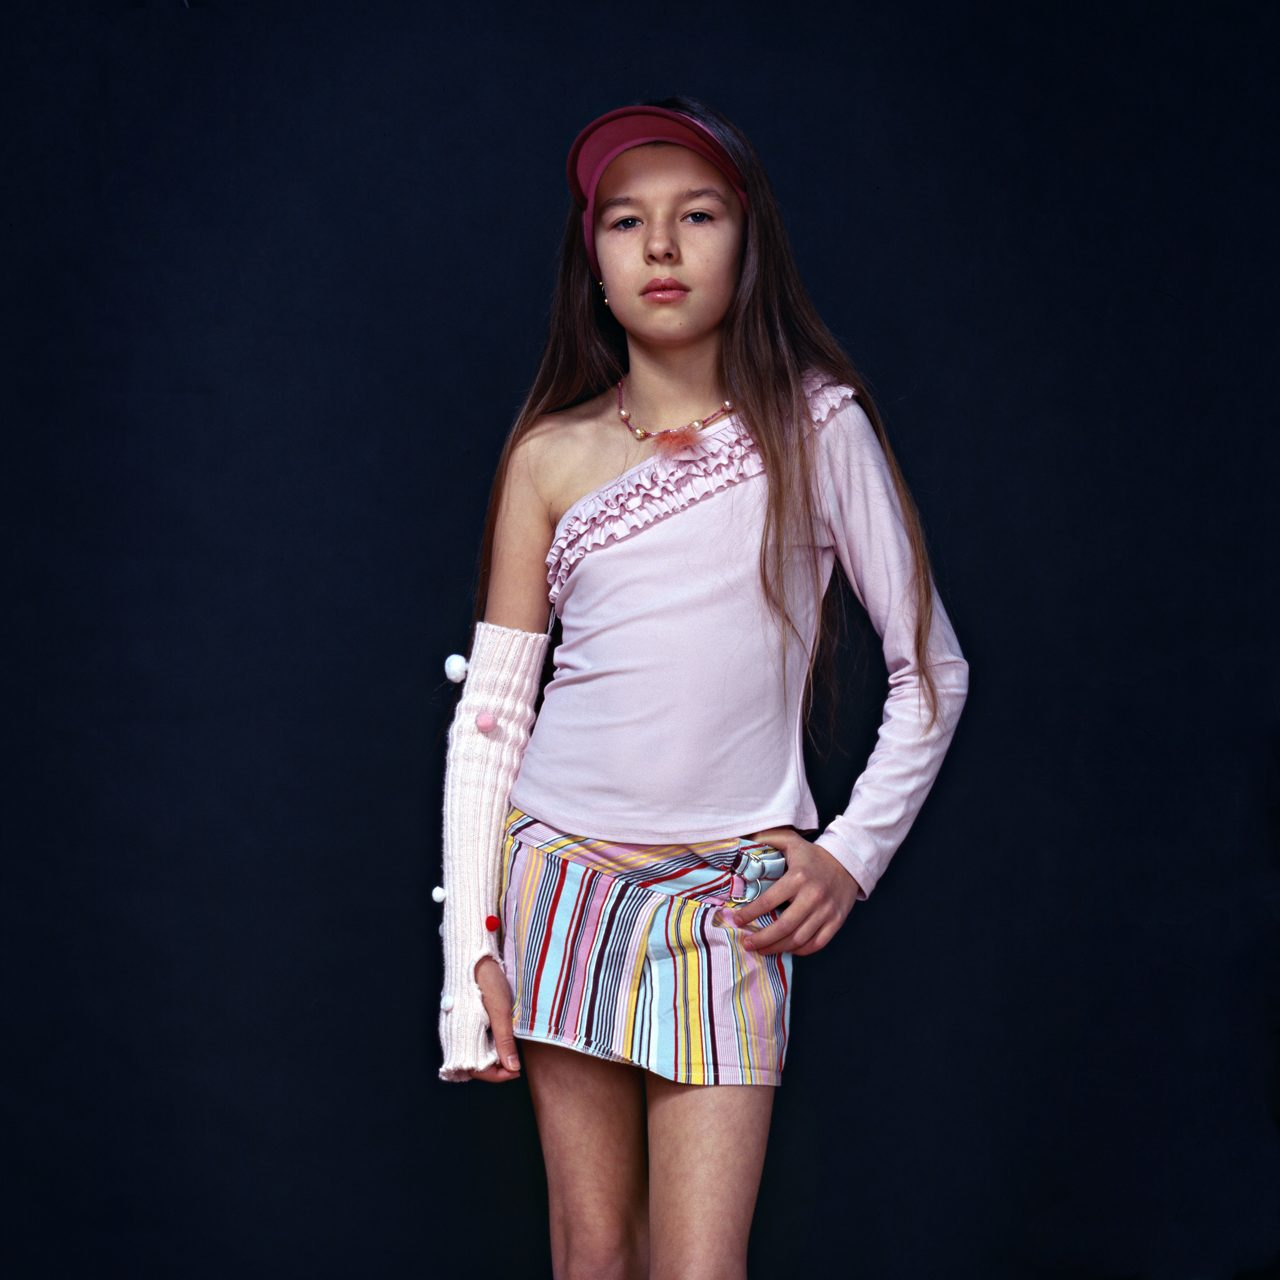 04-Samantha1-(un)dressed-jasper-groen